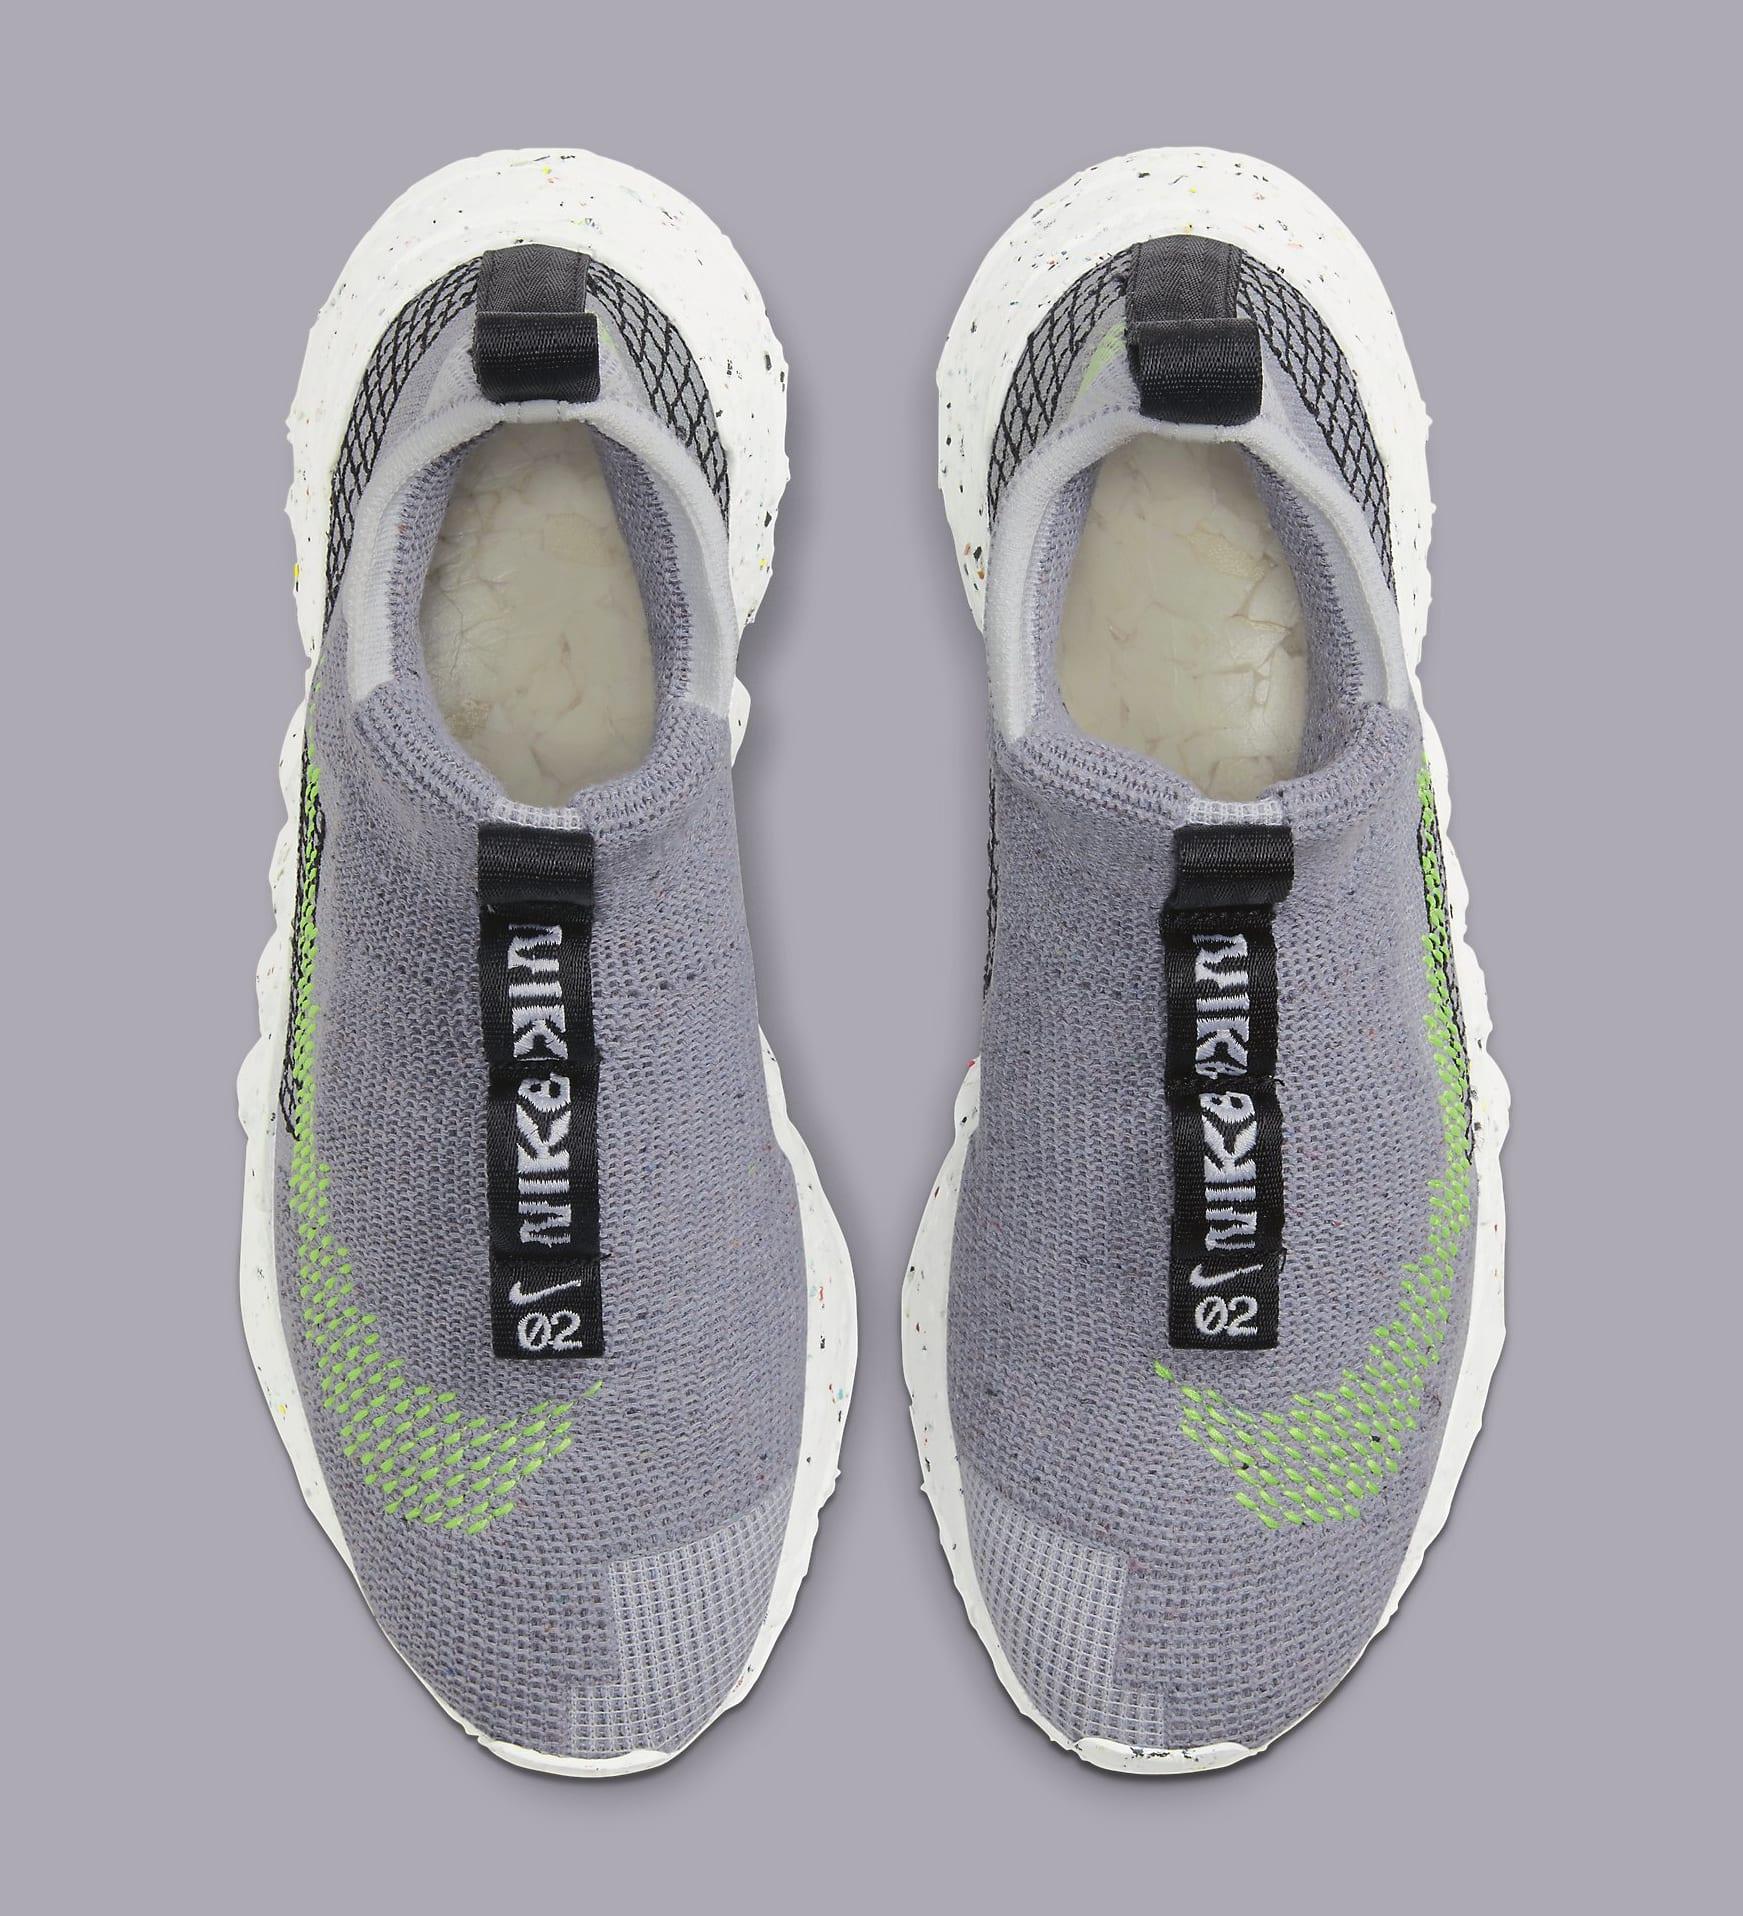 Nike Space Hippie 02 'Grey/Volt' CQ3988-002 Top